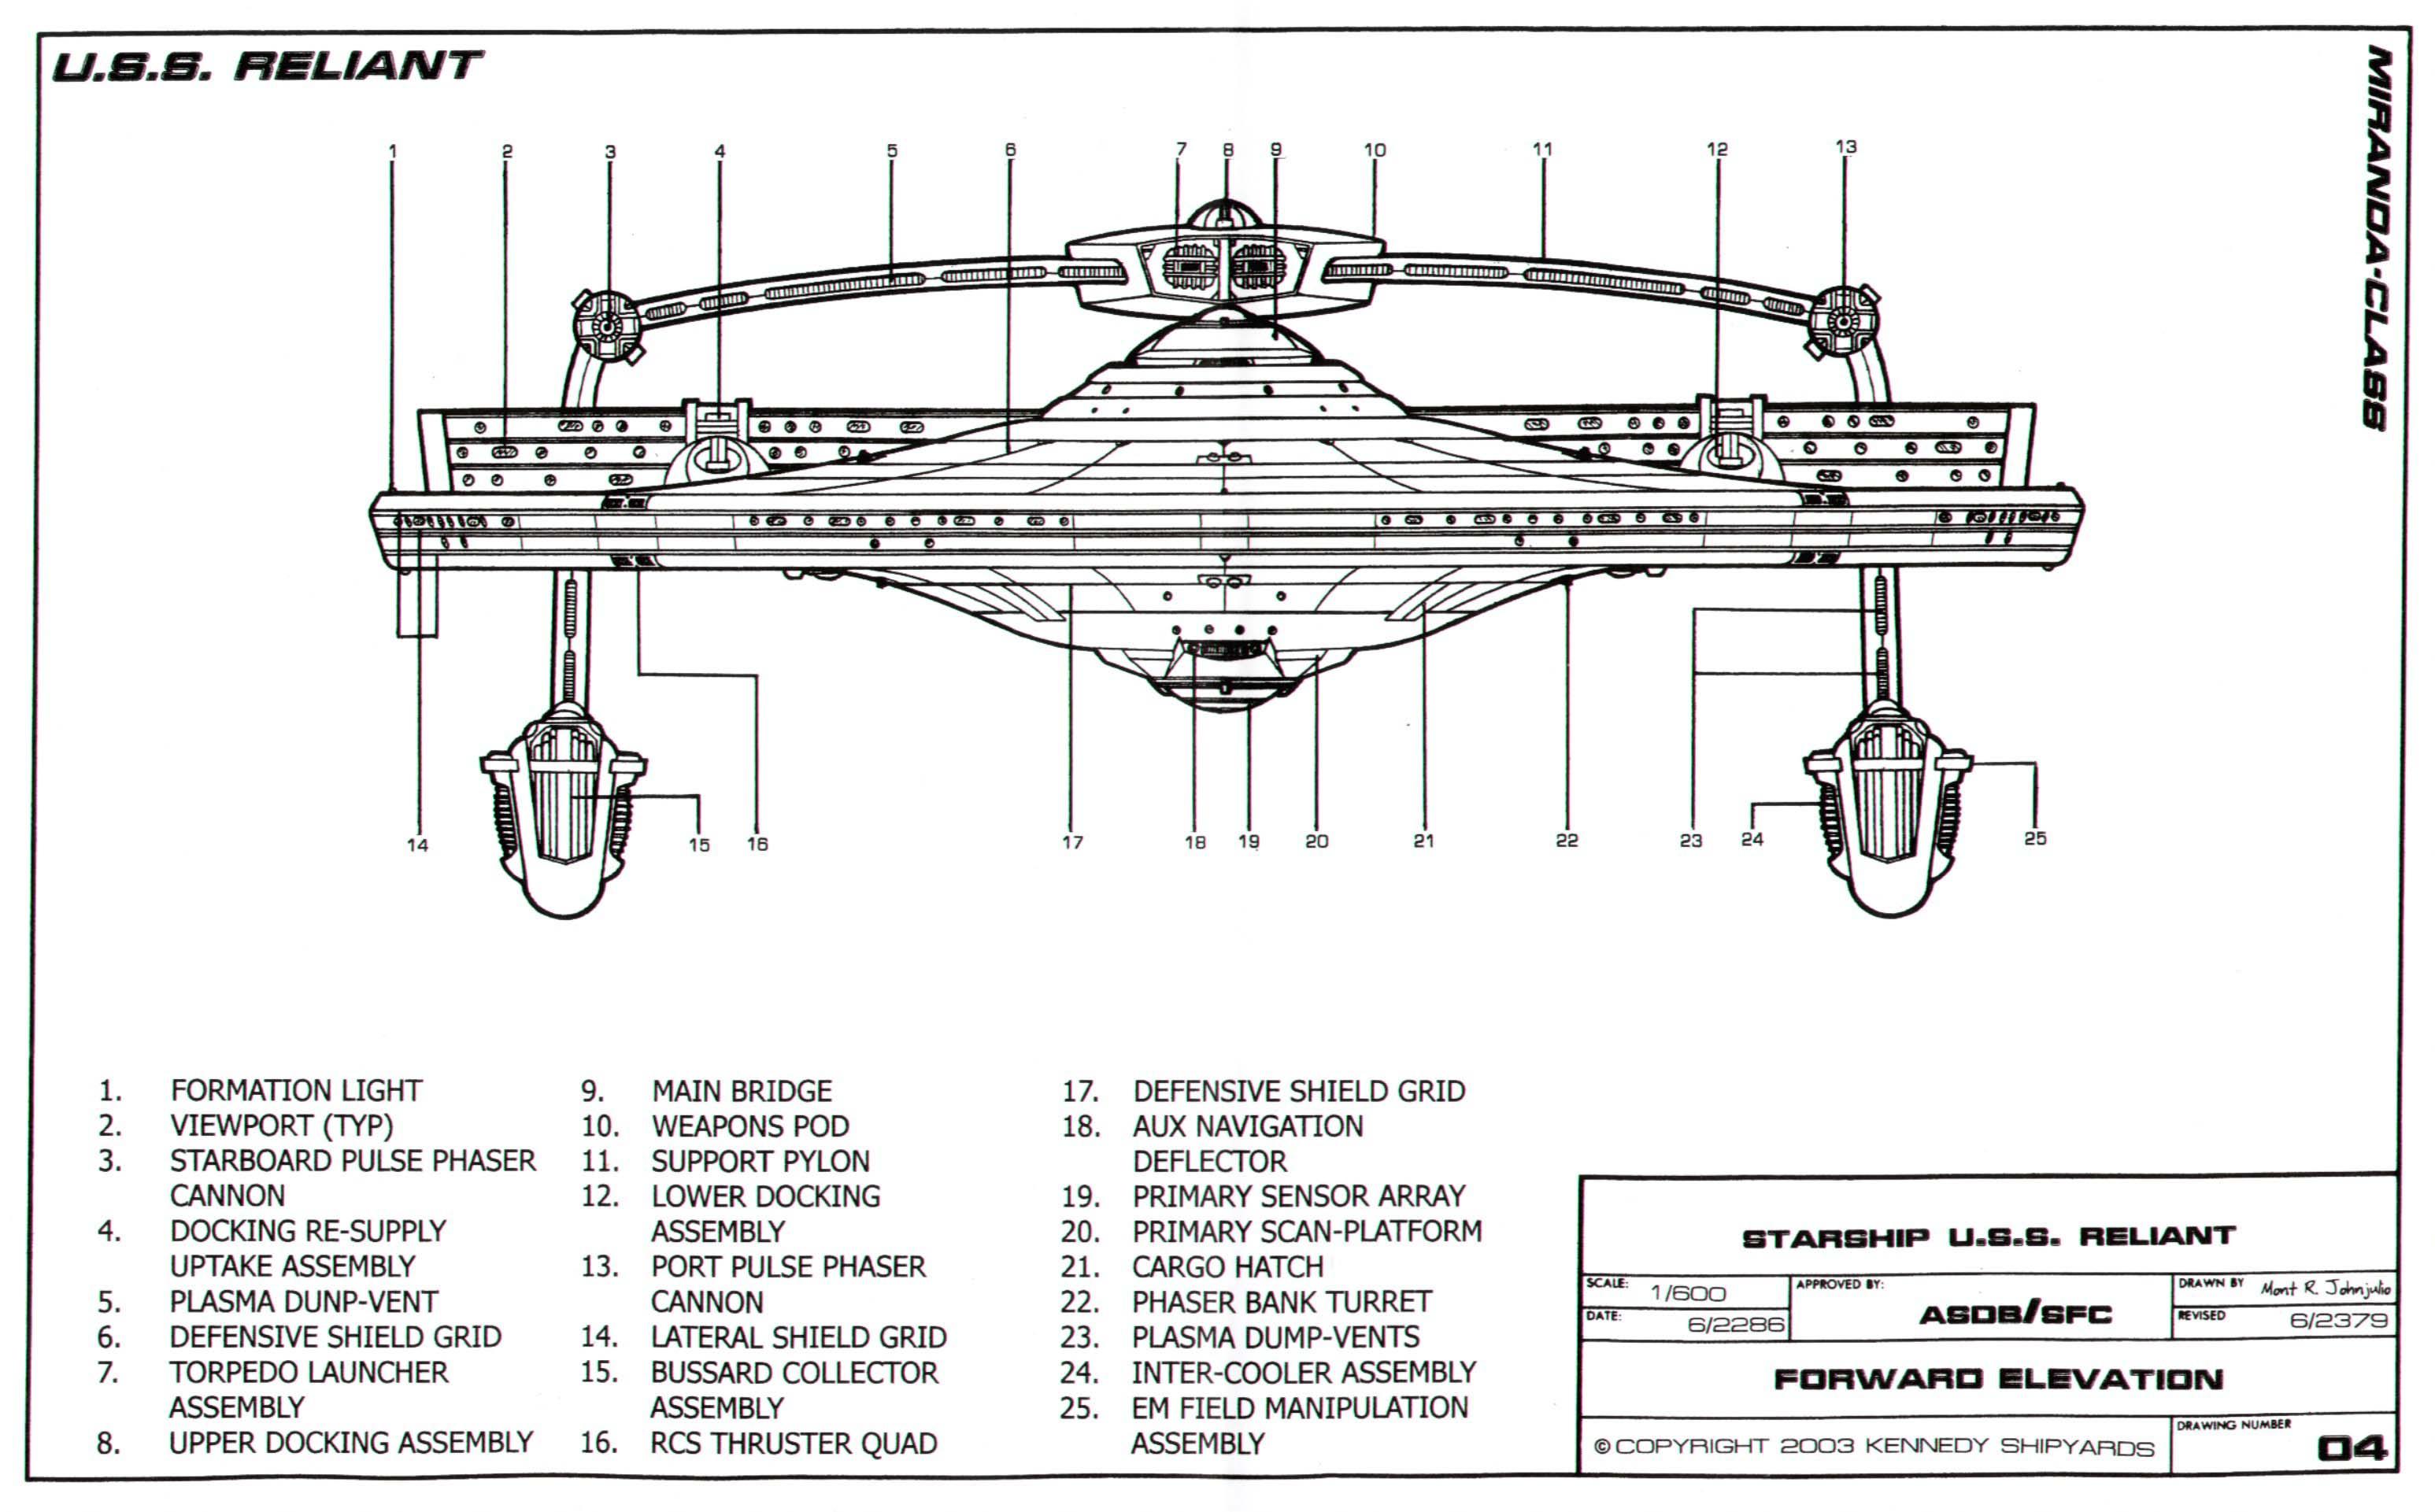 Ncc Wiring Diagram Building A Safc Star Trek Blueprints Miranda Class Starship U S Reliant 1864 Nce